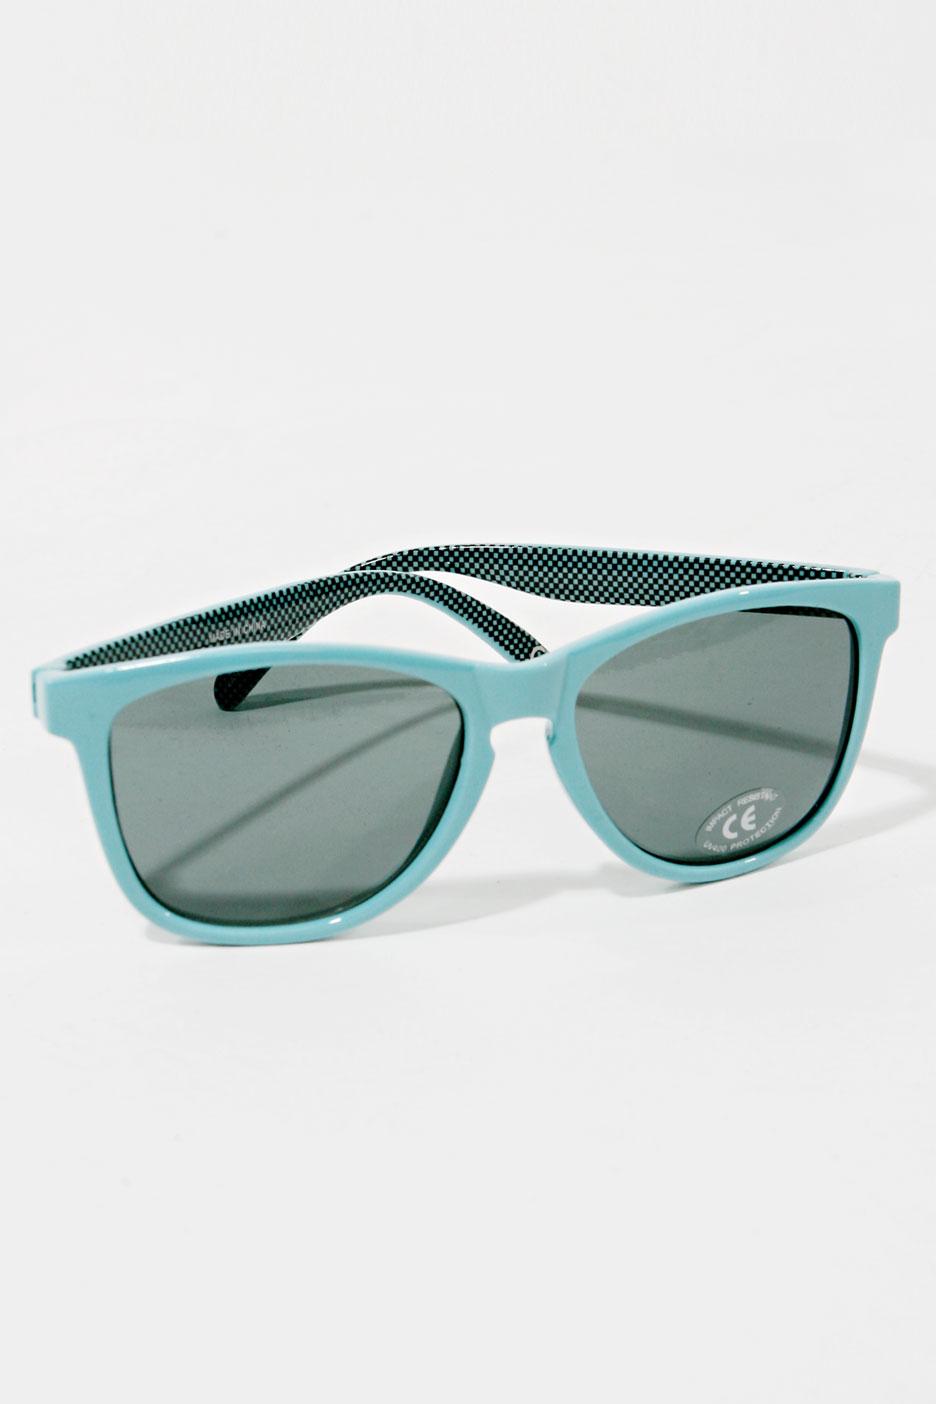 Tiffany Sunglasses Online Australia Cinemas 93